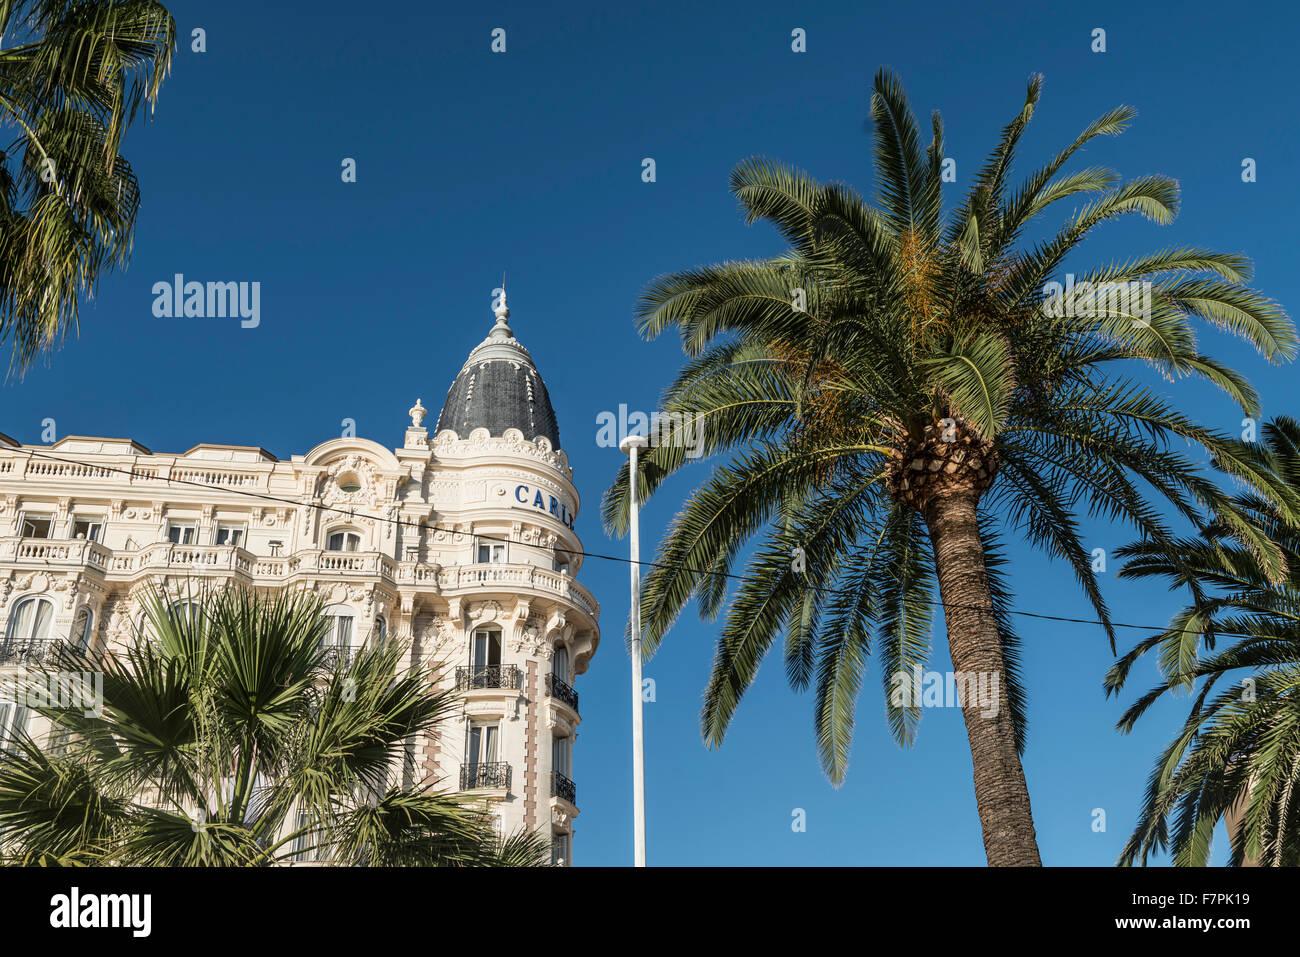 Carlton Hotel, Fassade, Palme, Cannes, Stockbild